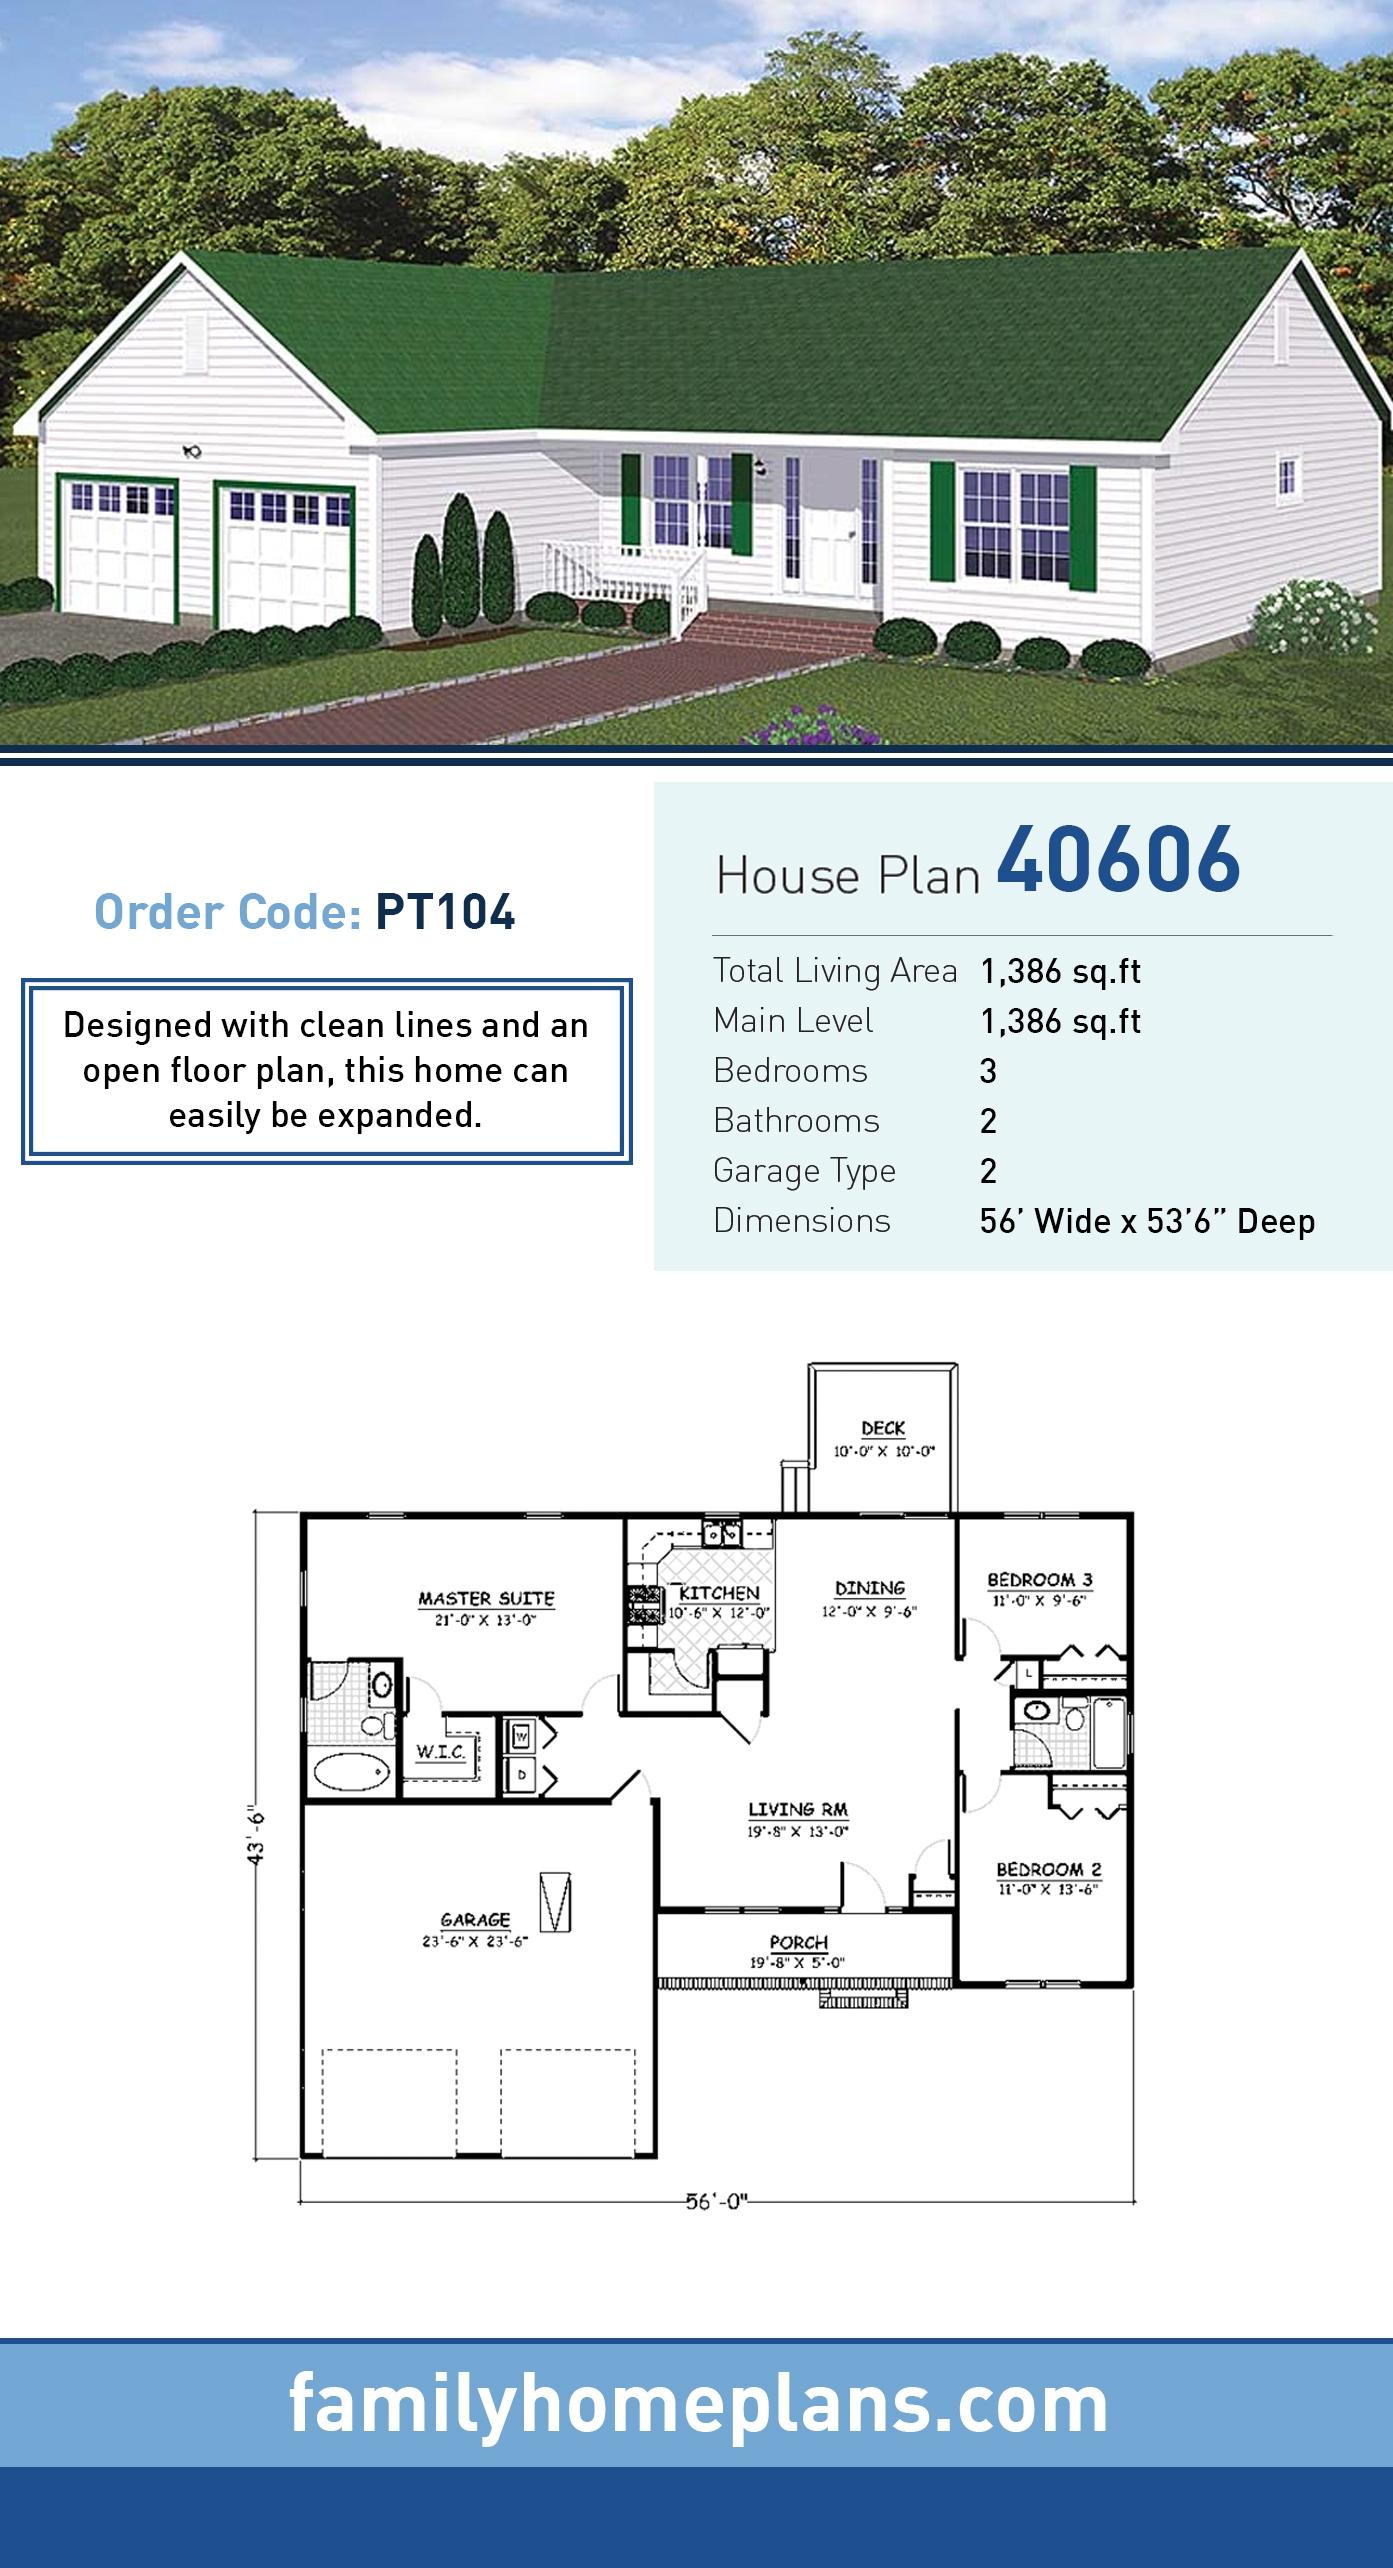 Ranch, Tudor House Plan 40606 with 3 Beds, 2 Baths, 2 Car Garage